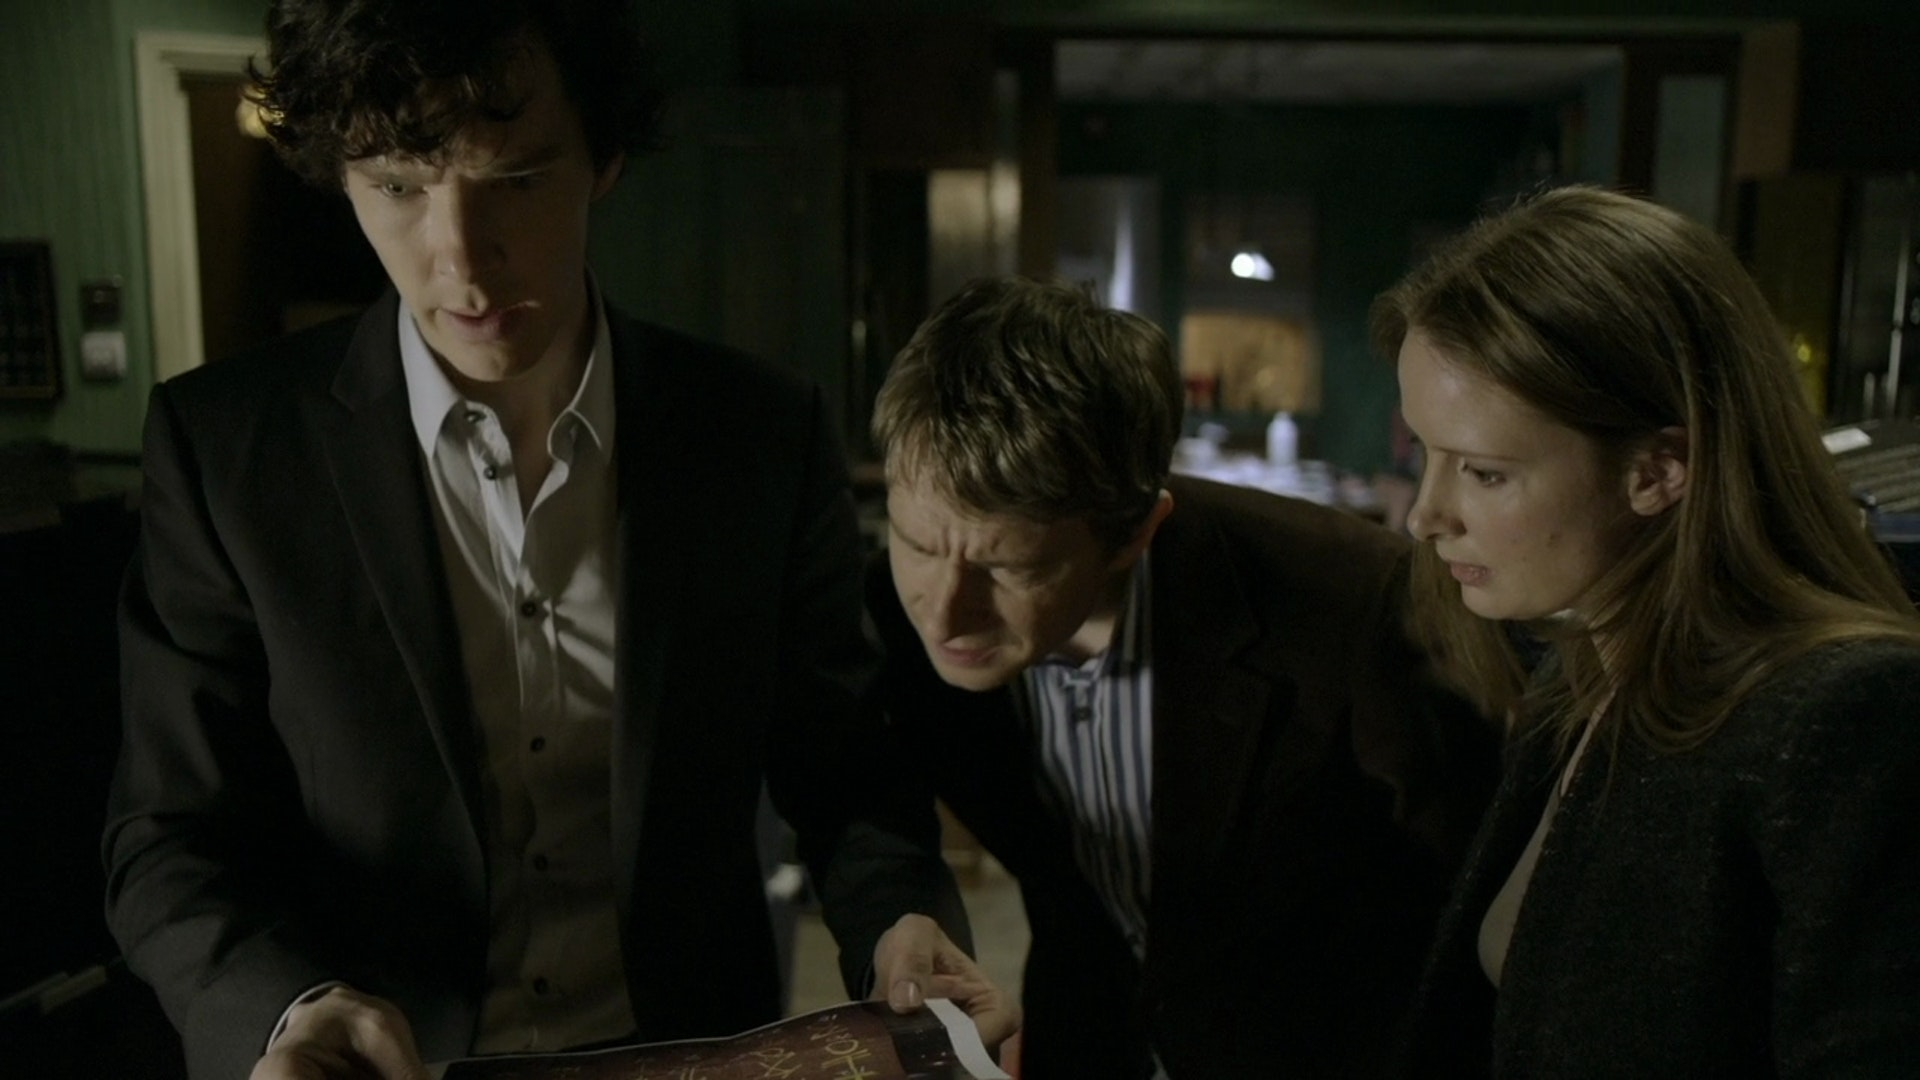 sherlock-1x02-the-blind-banker-sherlock-holmes-and-john-watson-34985573-1280-720